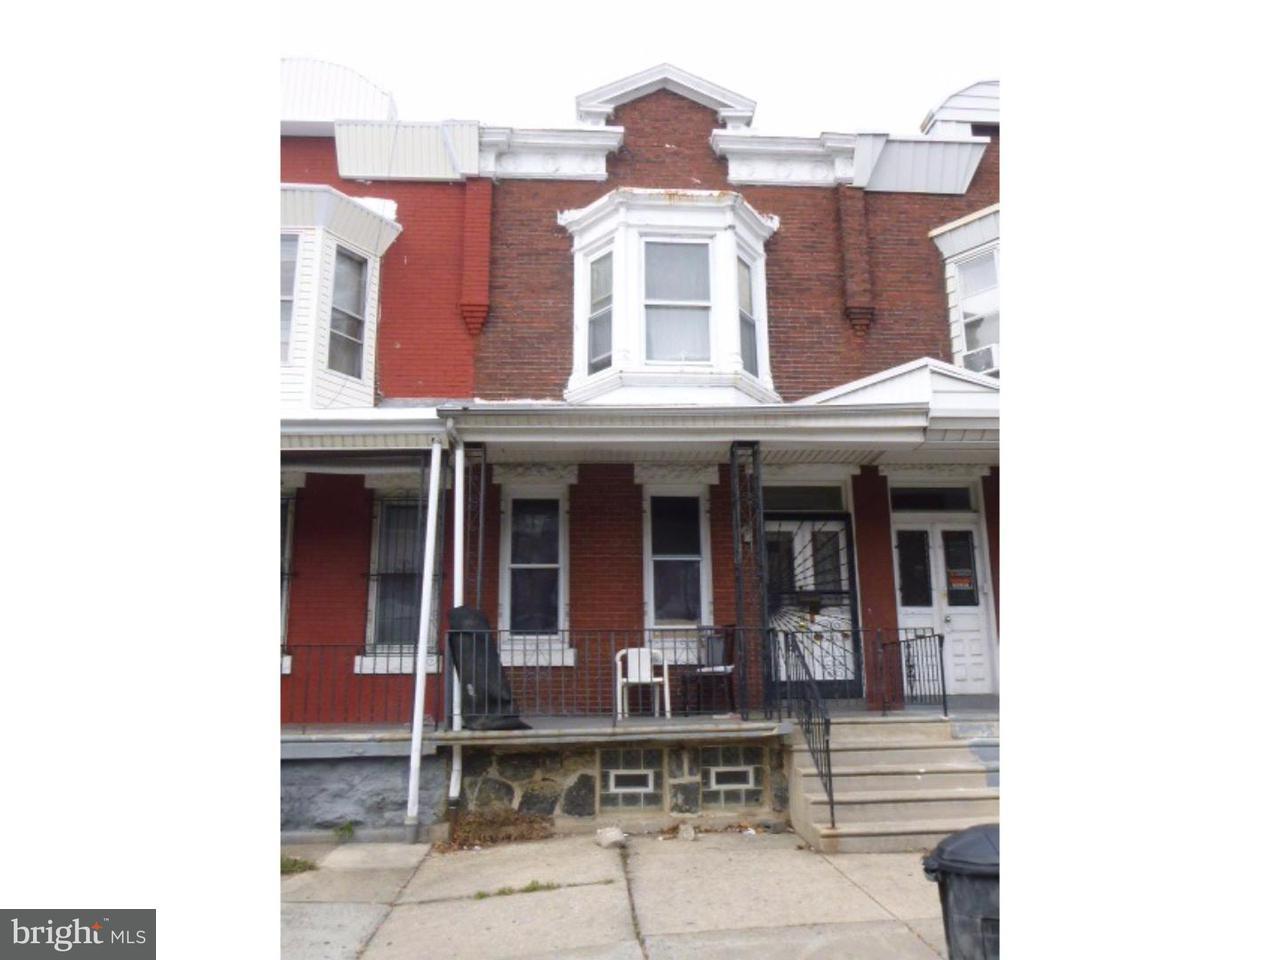 1304 N 53RD Philadelphia, PA 19131